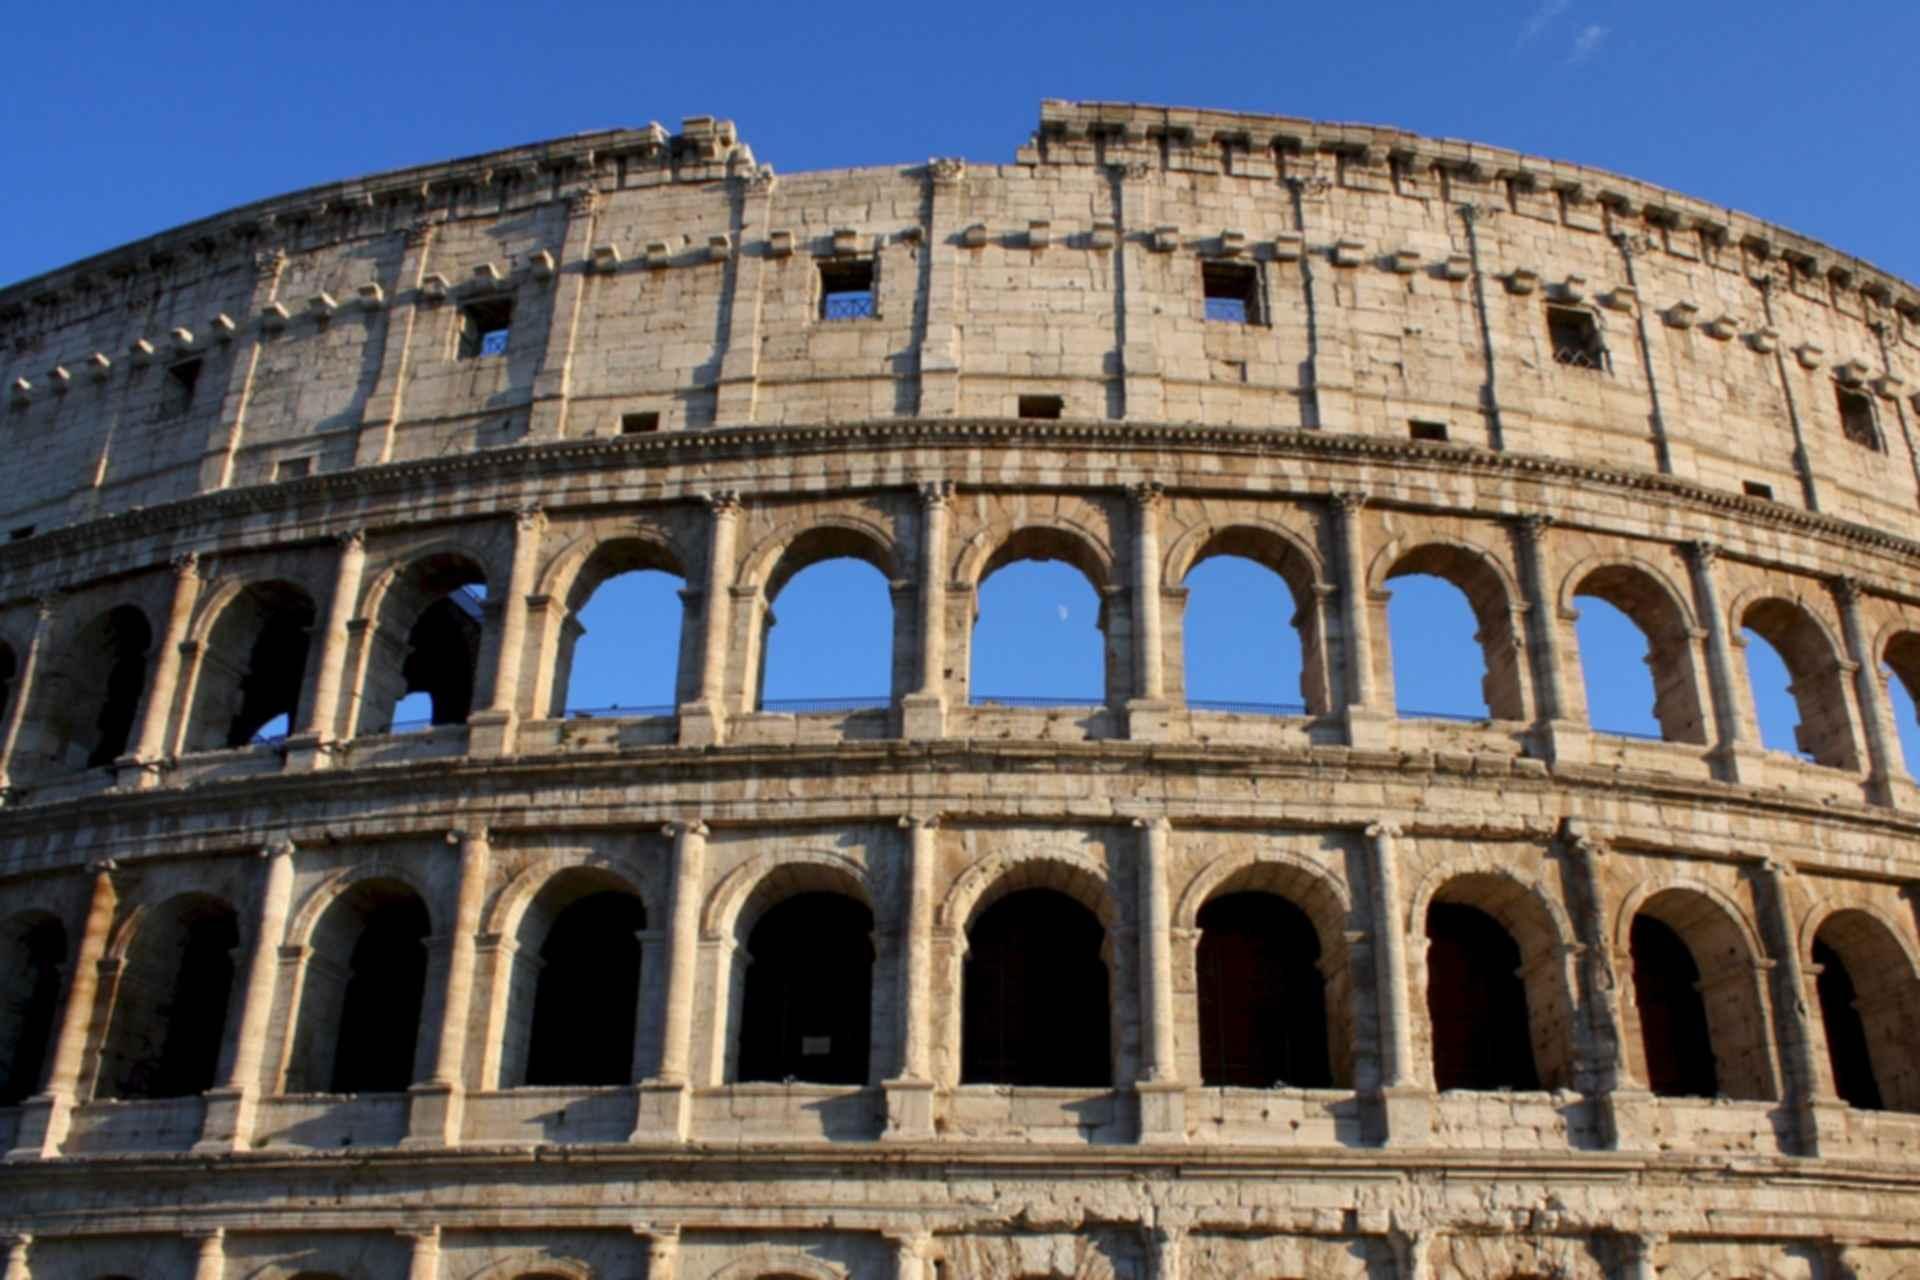 Colosseum - Front Exterior